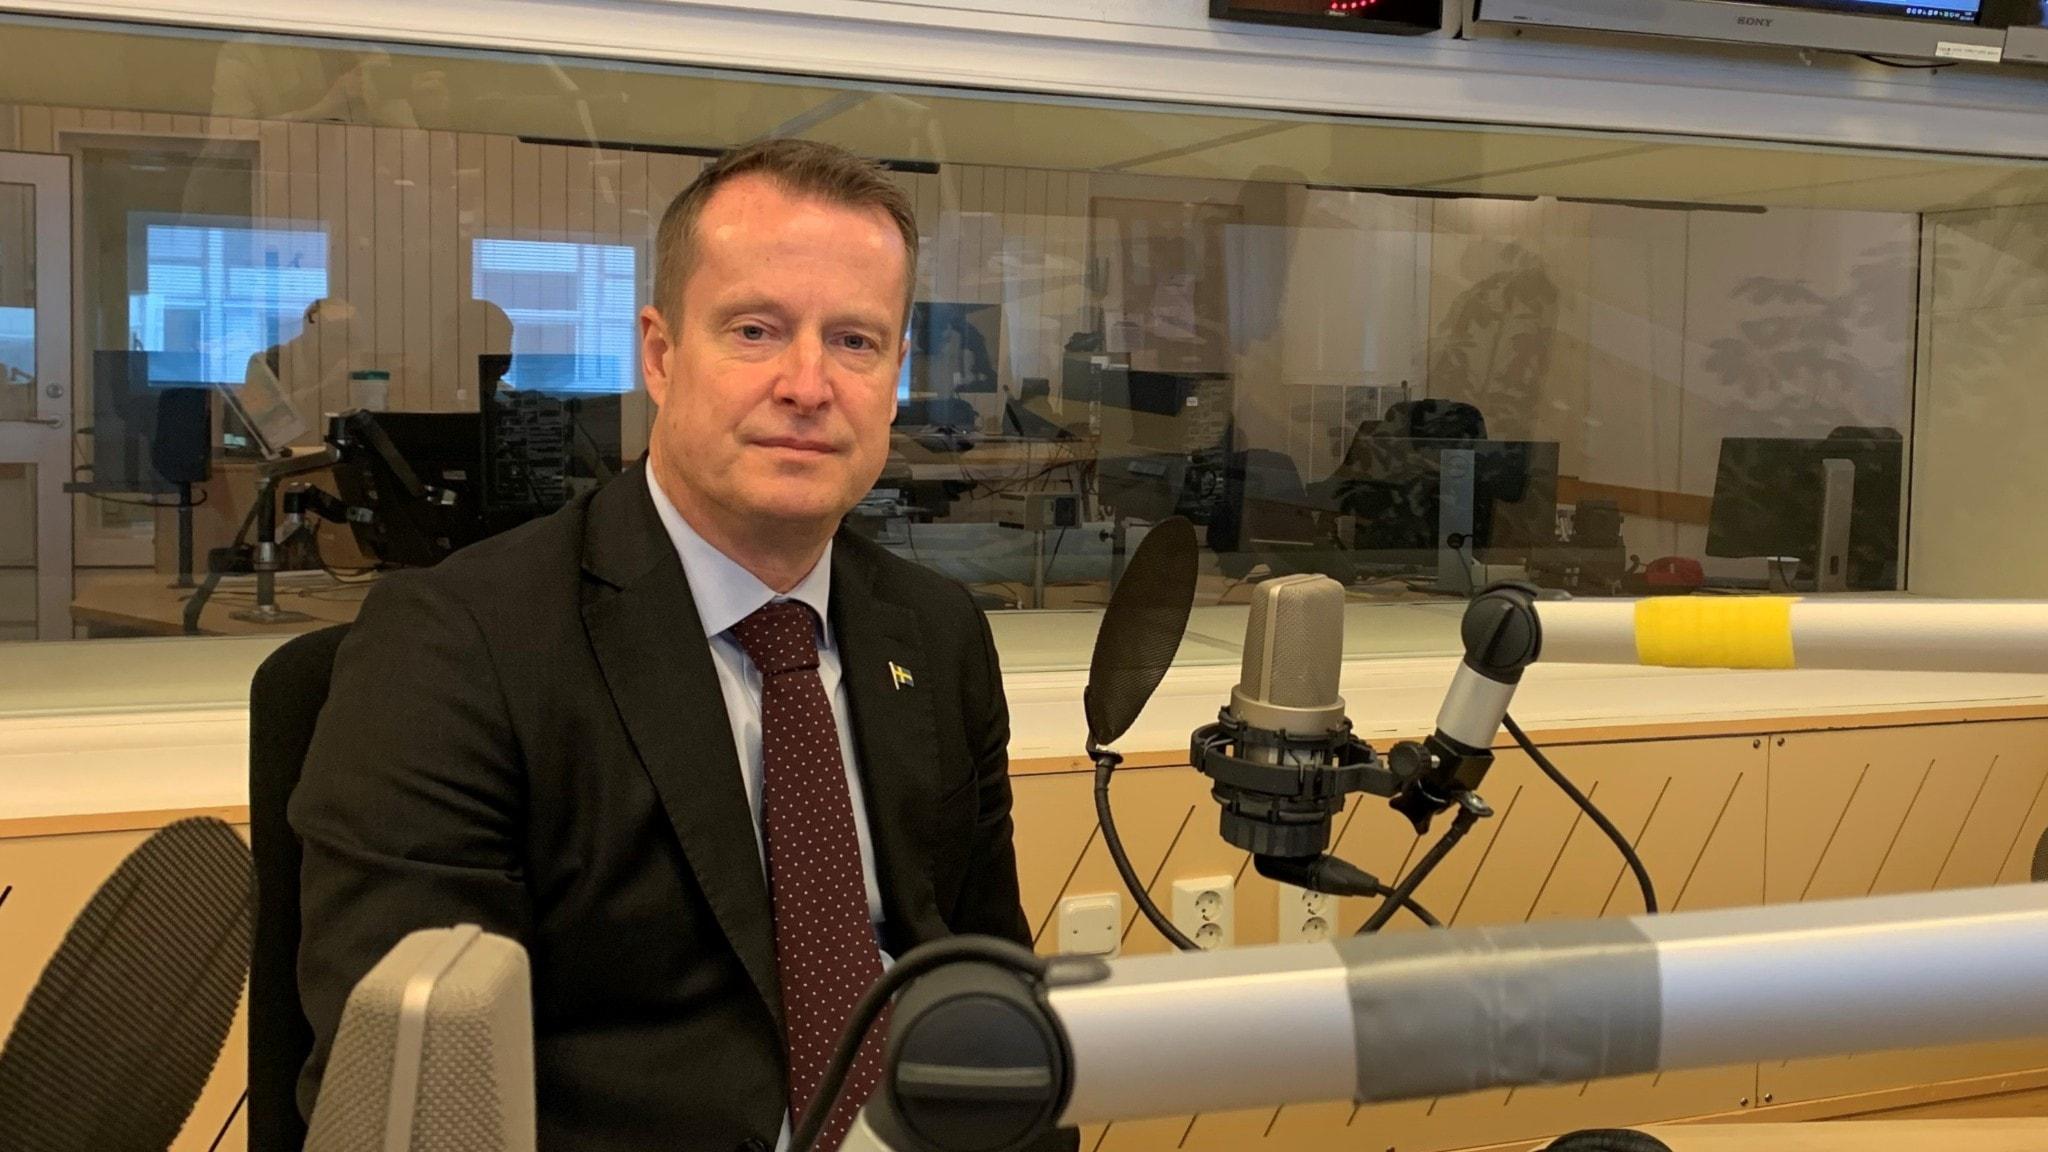 Ekots lördagsintervju med Anders Ygeman (S)